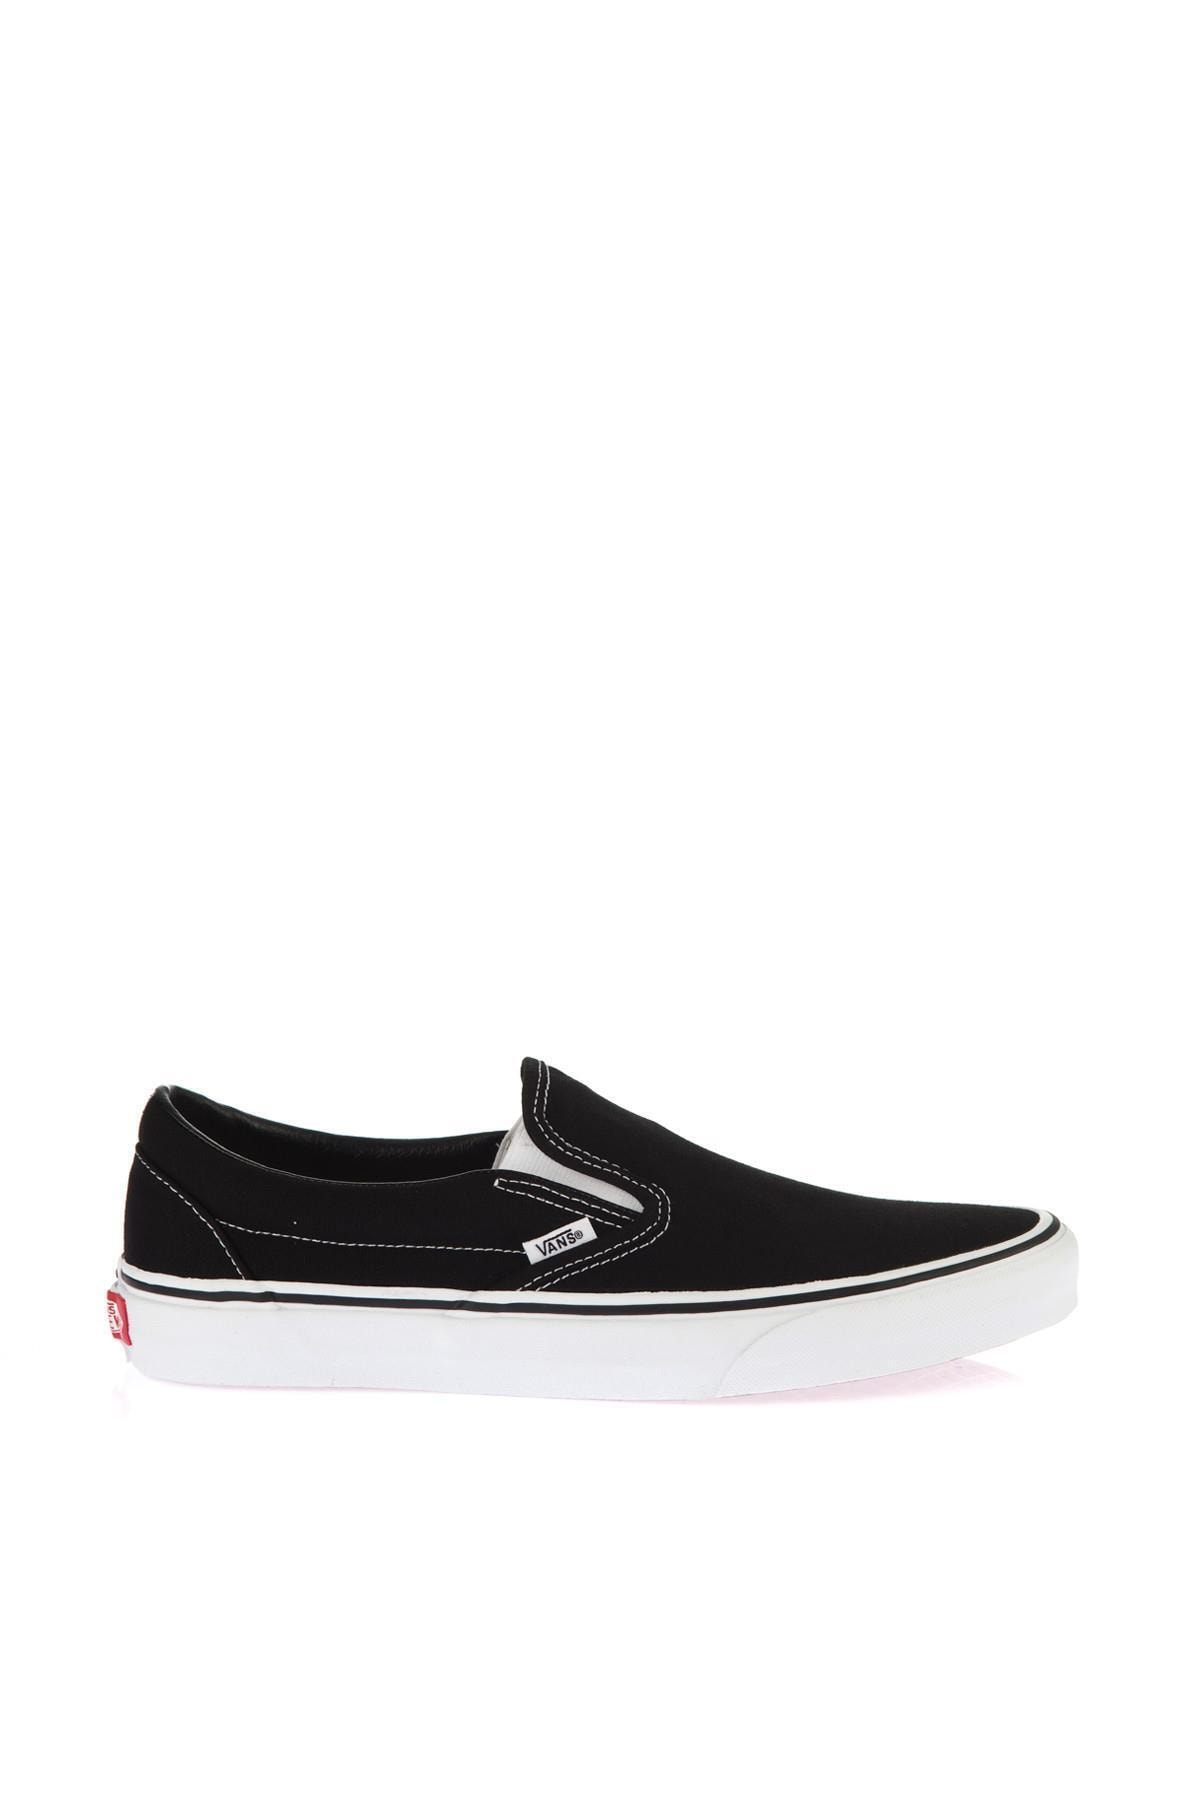 Vans CLASSIC SLIP-ON Siyah Erkek Sneaker 100288346 1